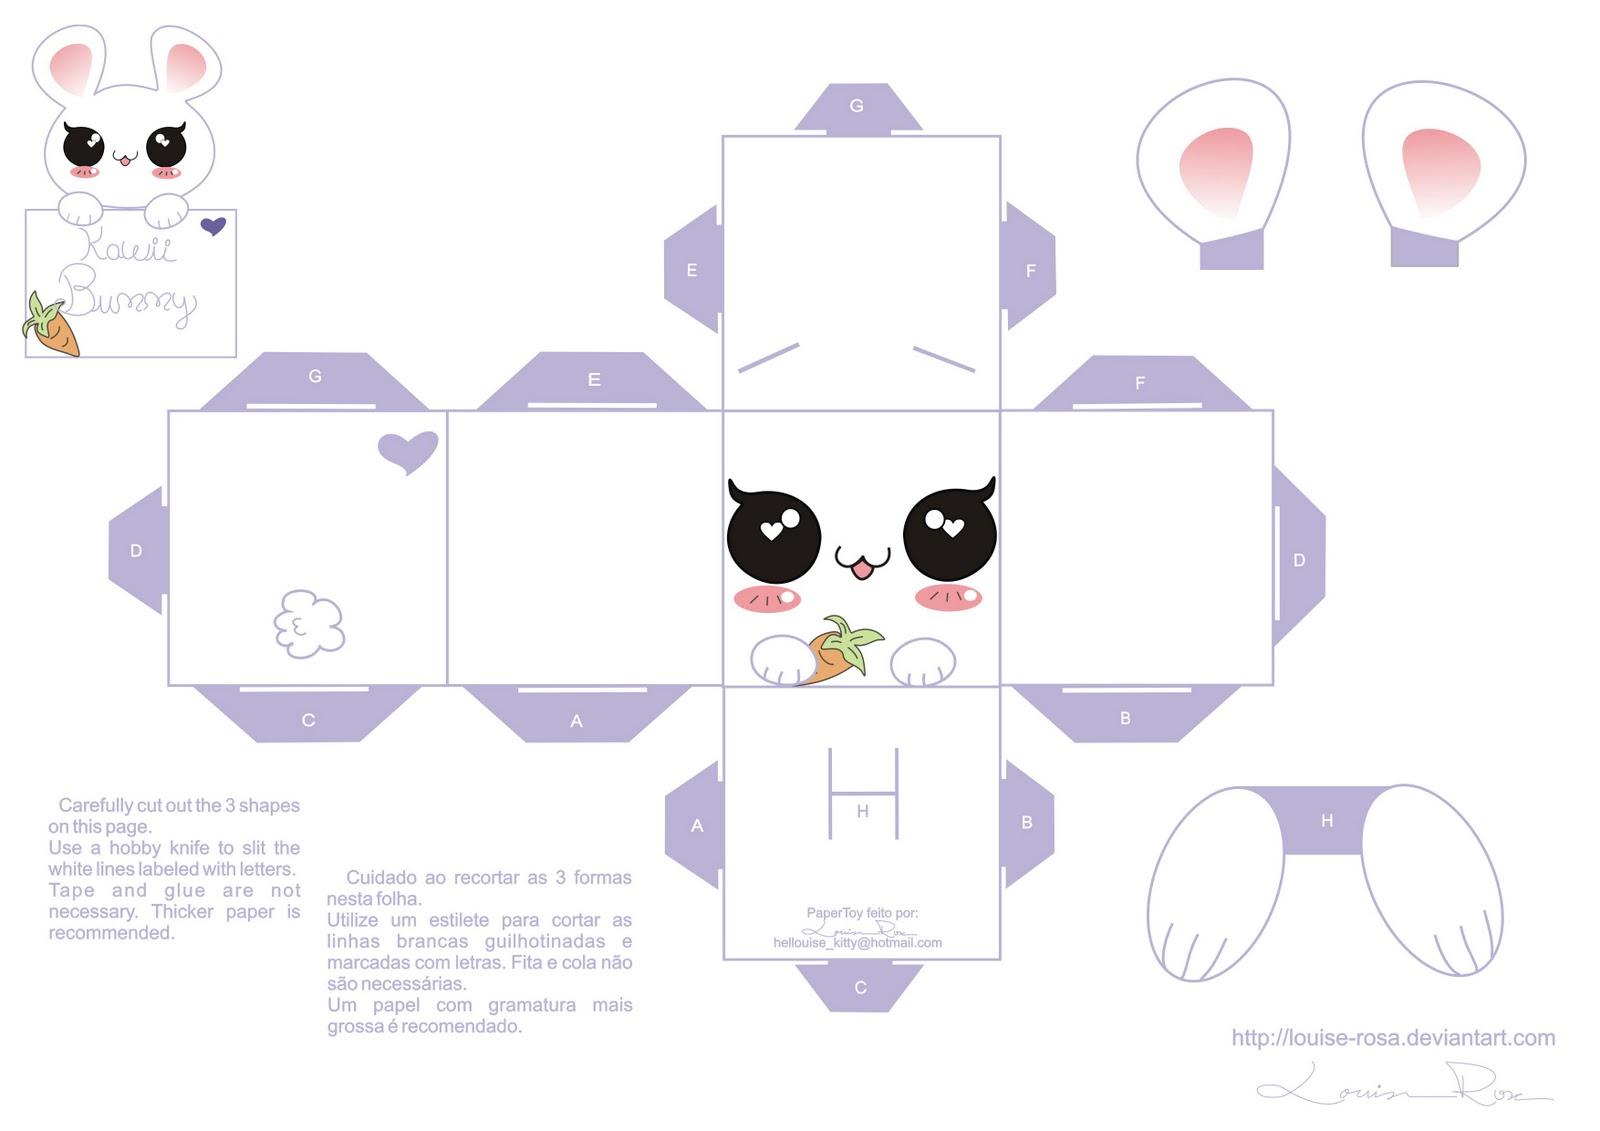 Papercraft! Diviertete Armando! [Megapost!]